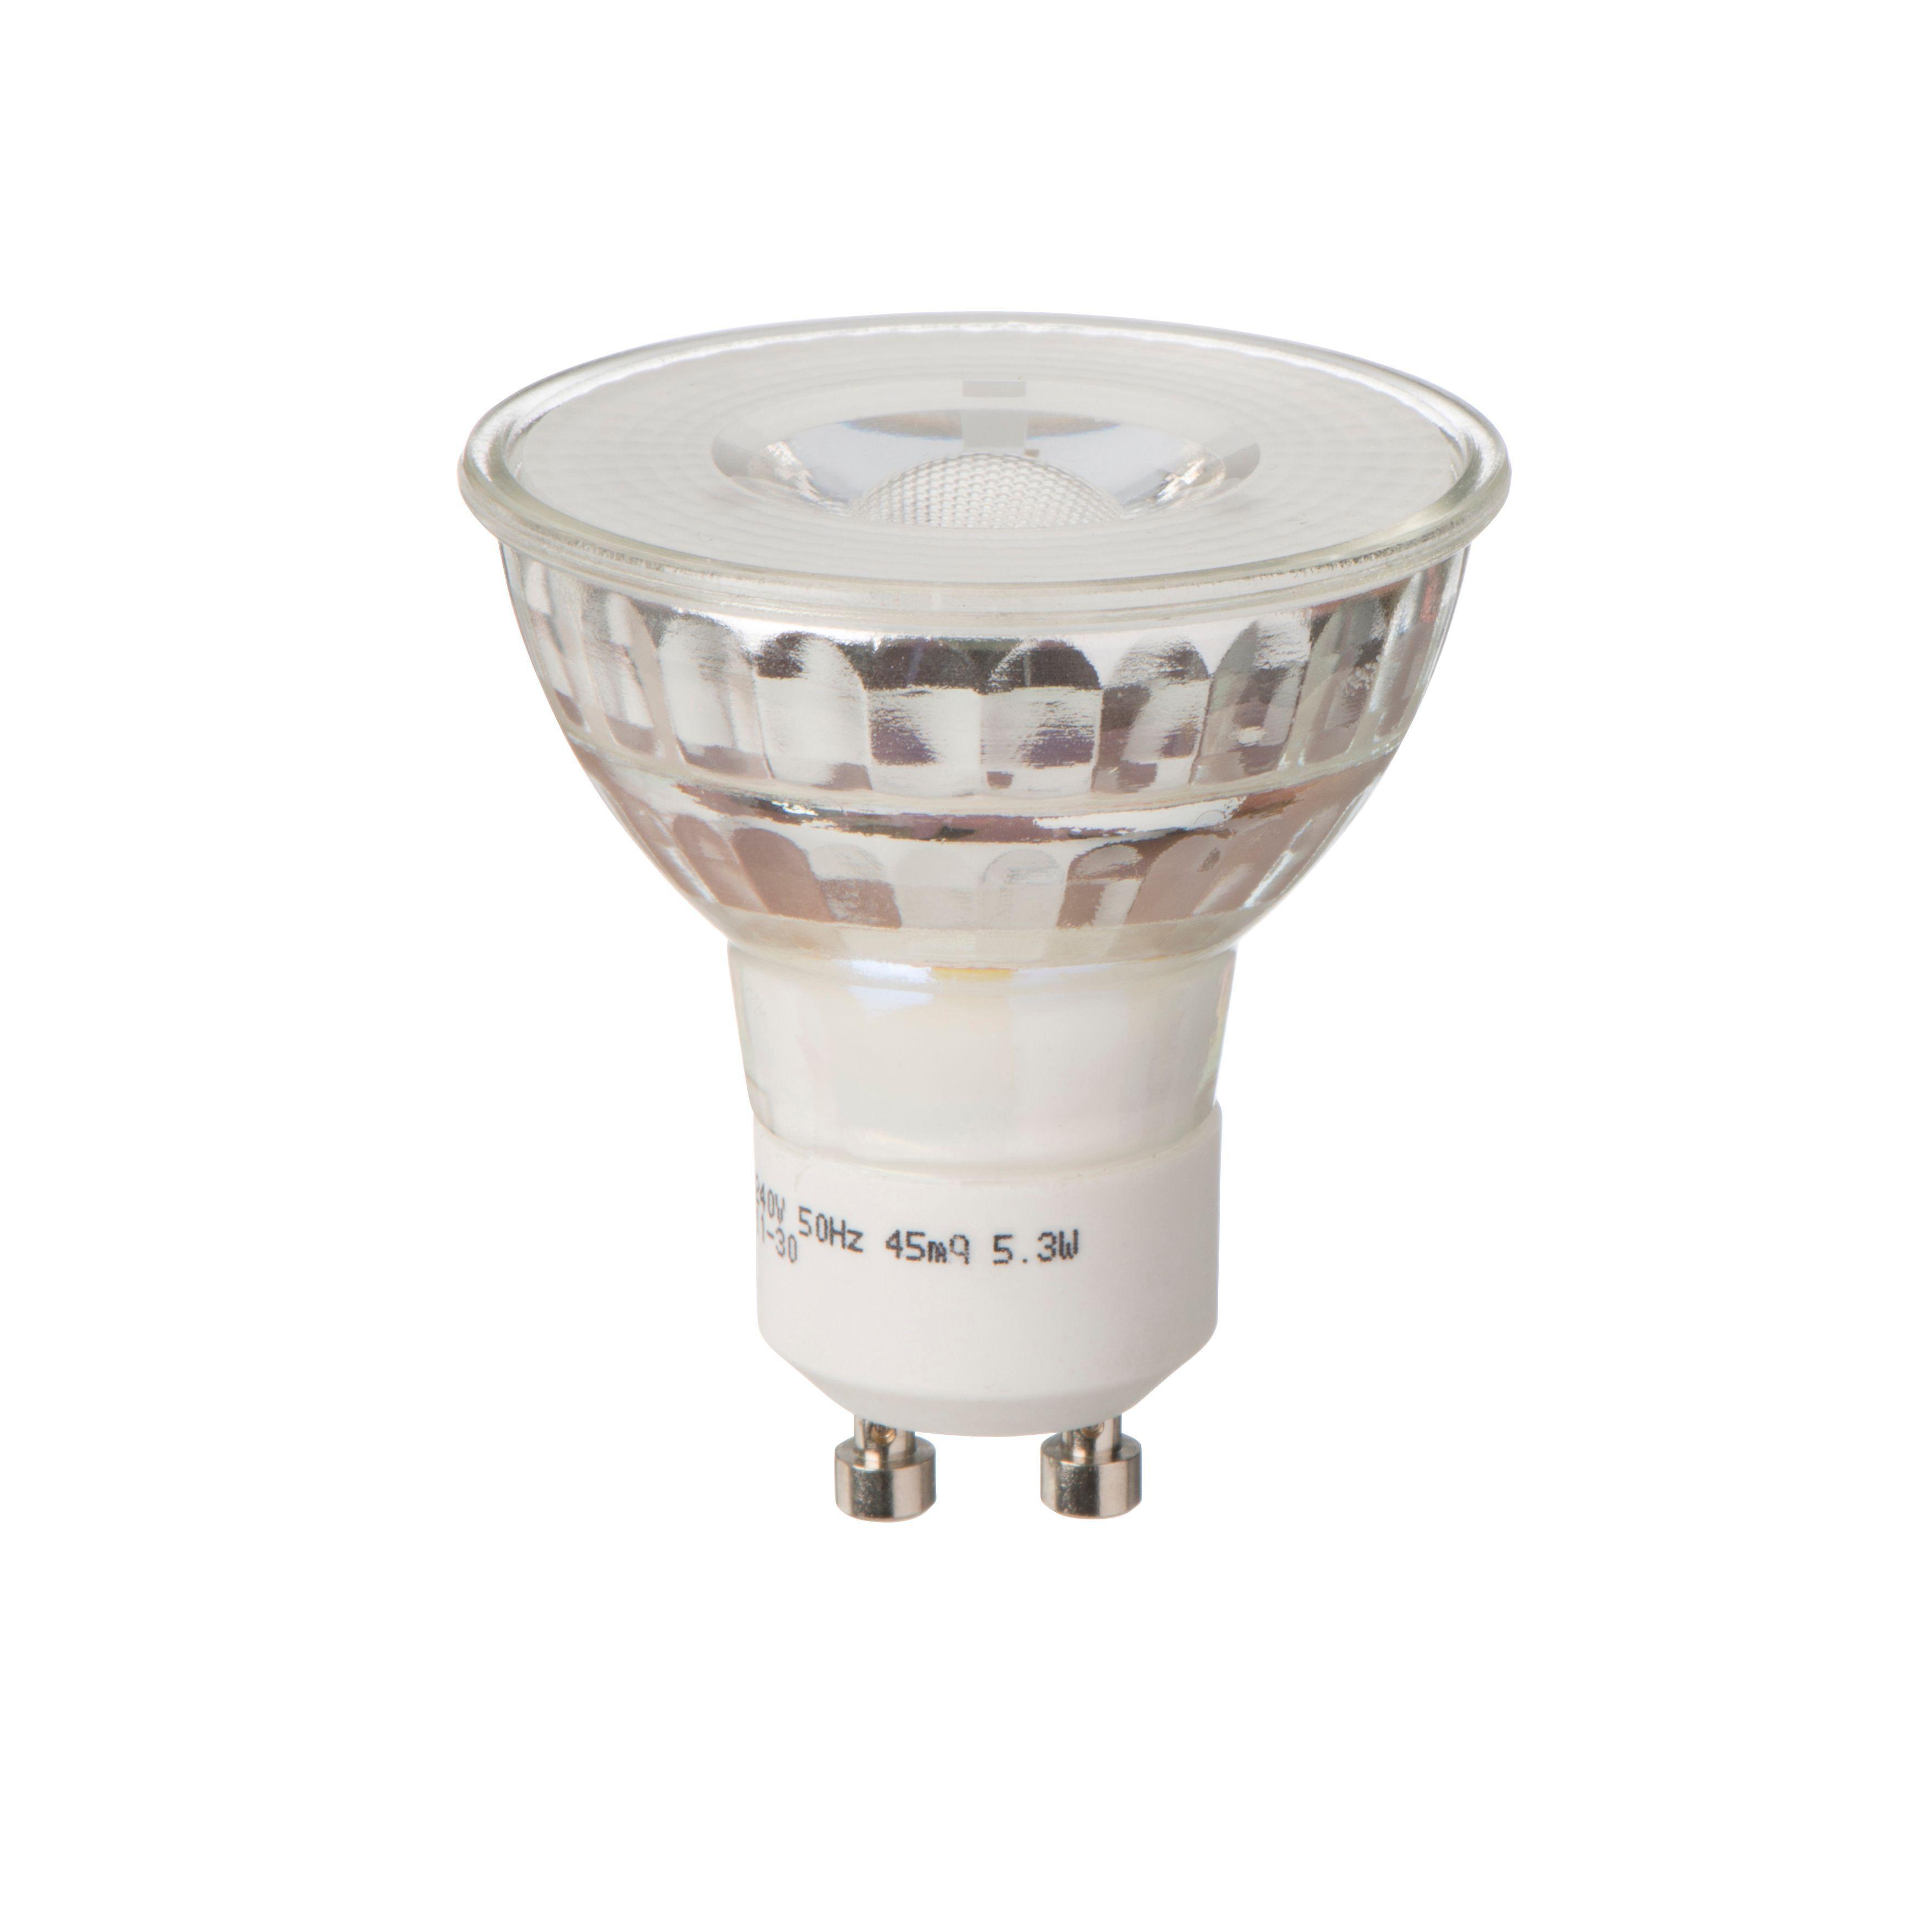 Diall Gu10 345lm Led Reflector Light Bulb